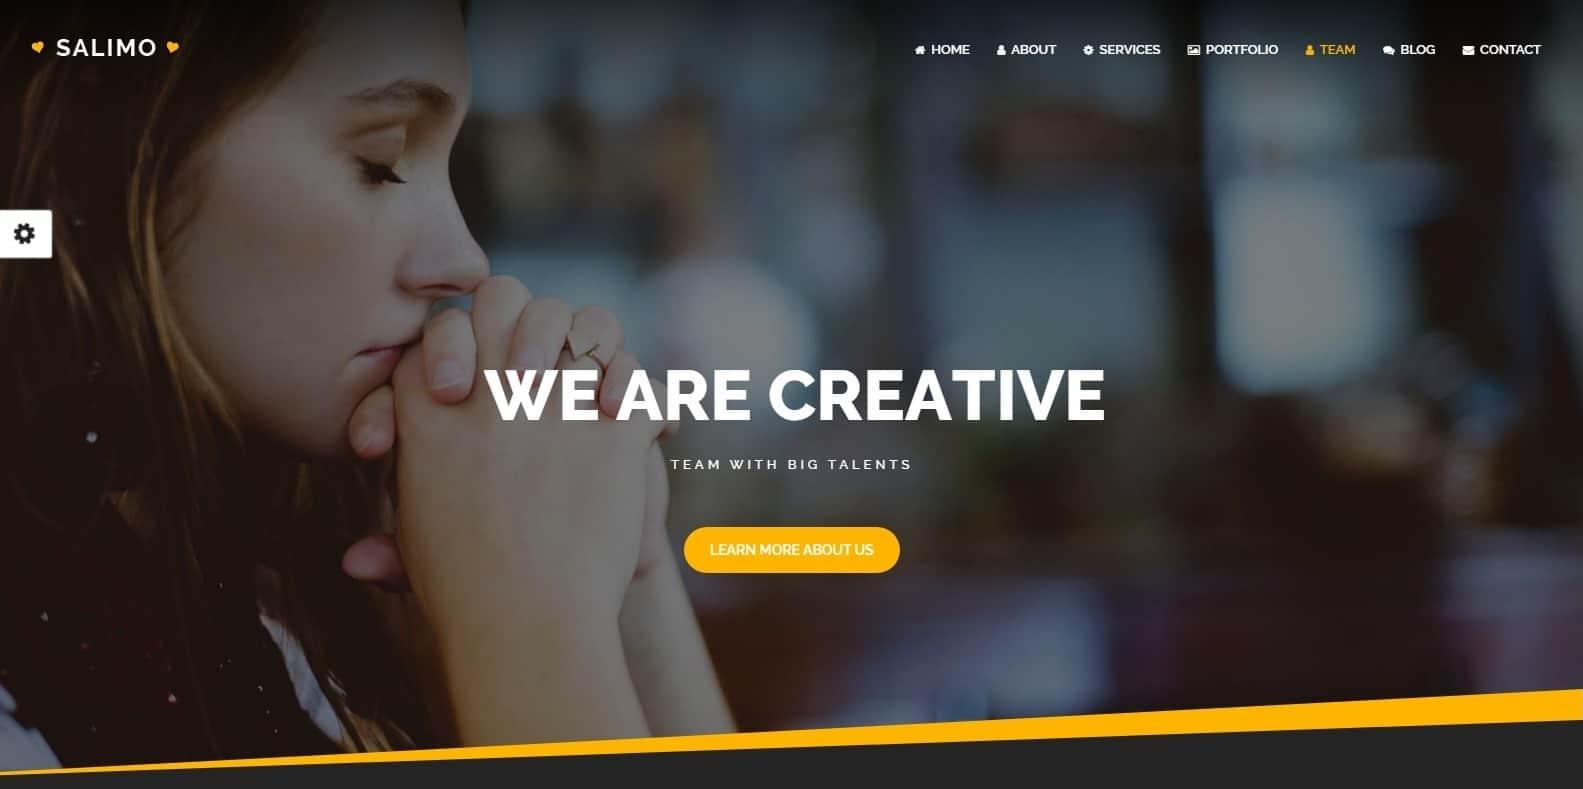 salimo-blog-website-template